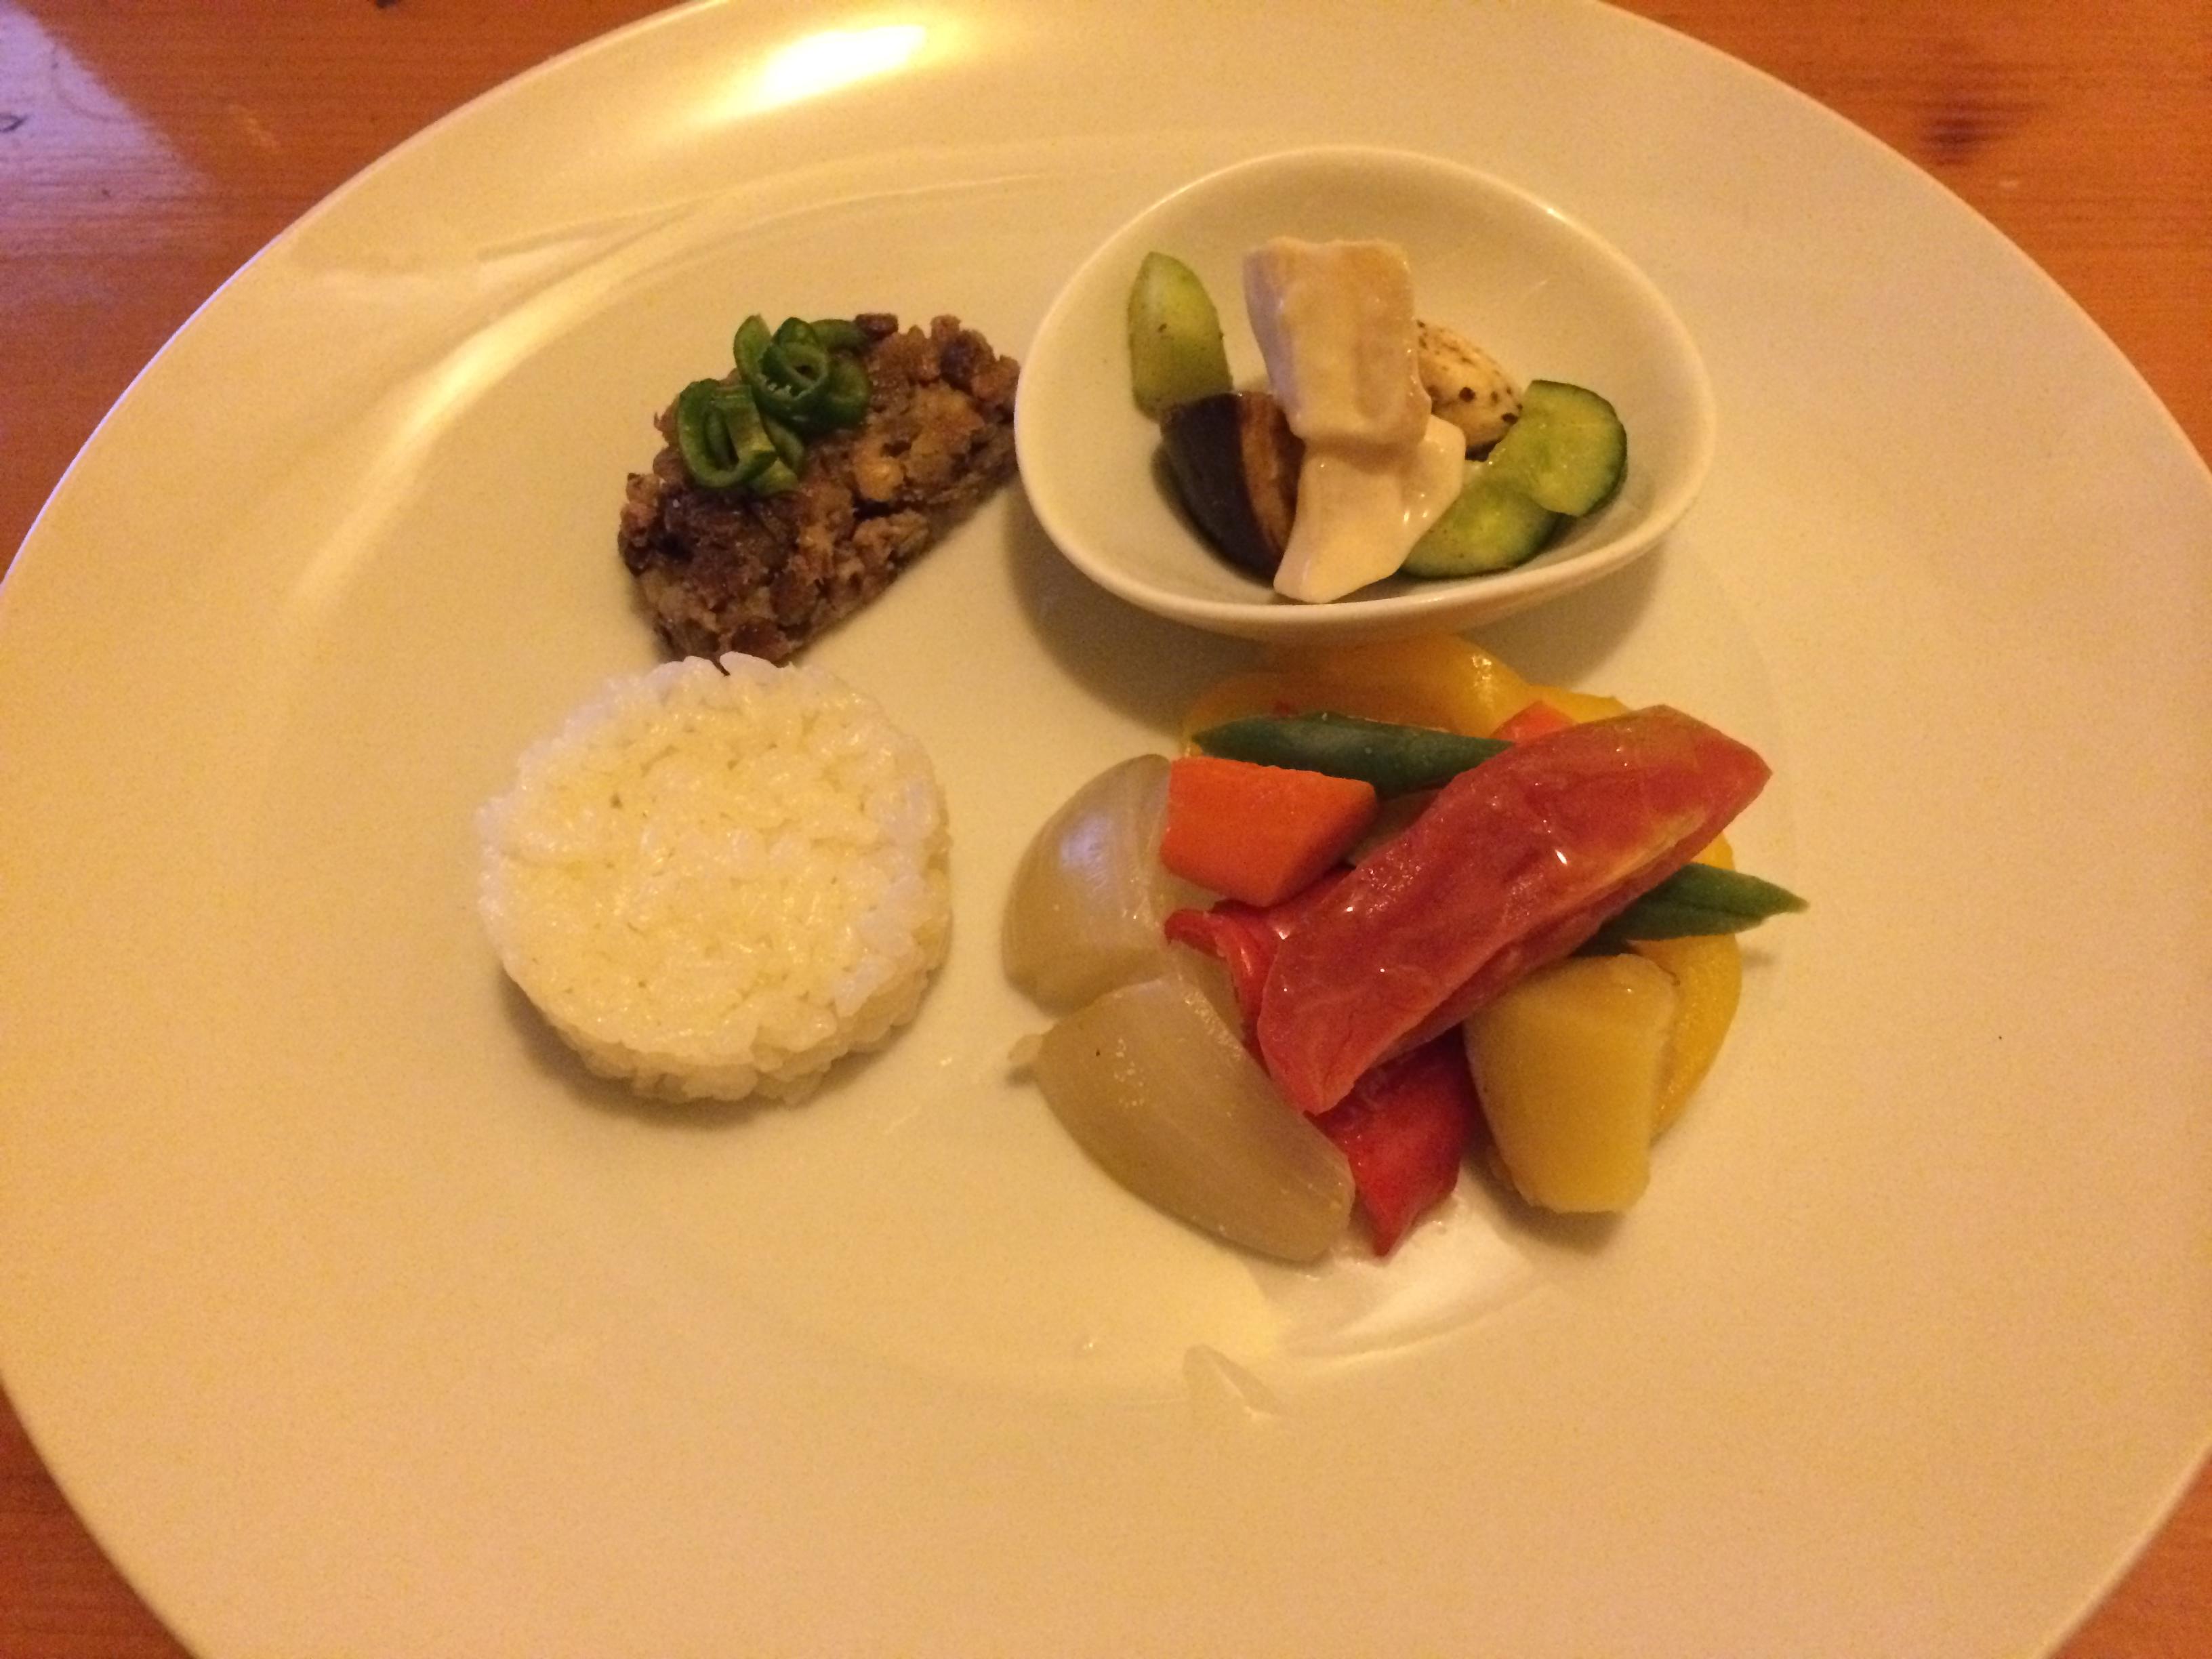 Bistro la fourchette美山野菜の温製、お米添え